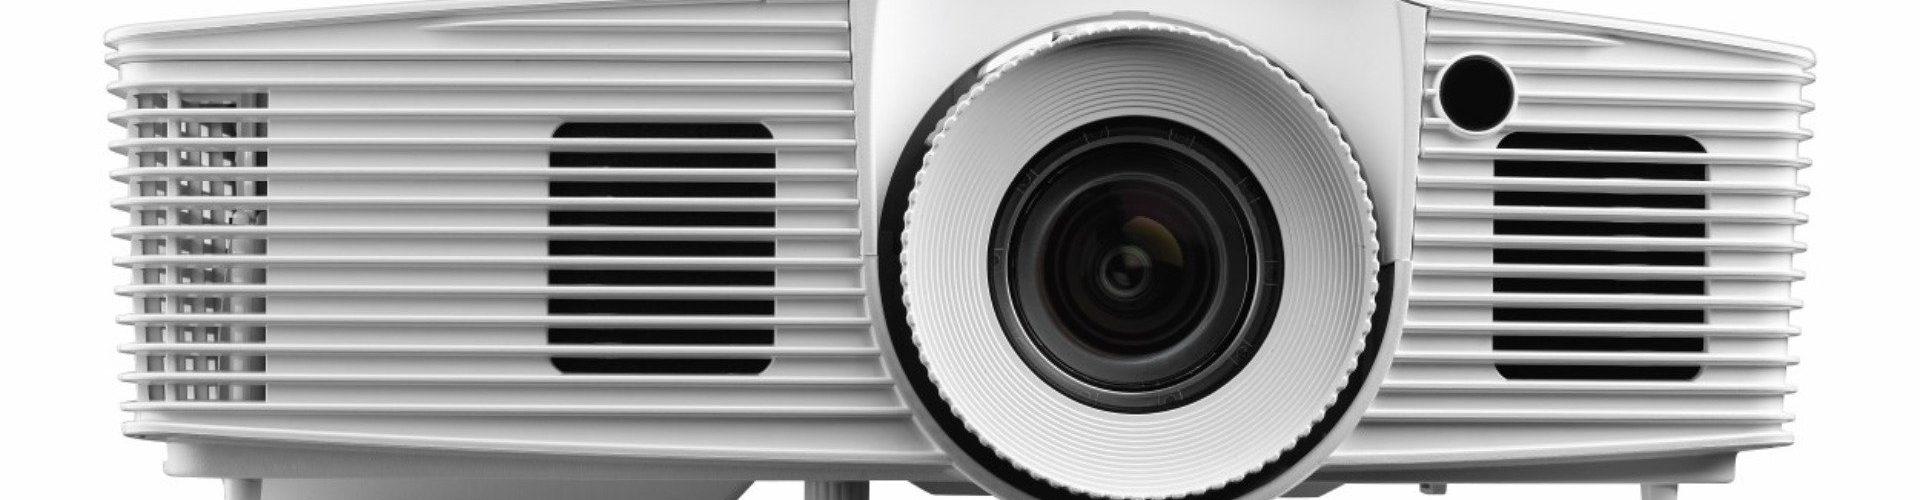 Best Projectors Under 300: 5 Top $300 projectors Of 2021 ...